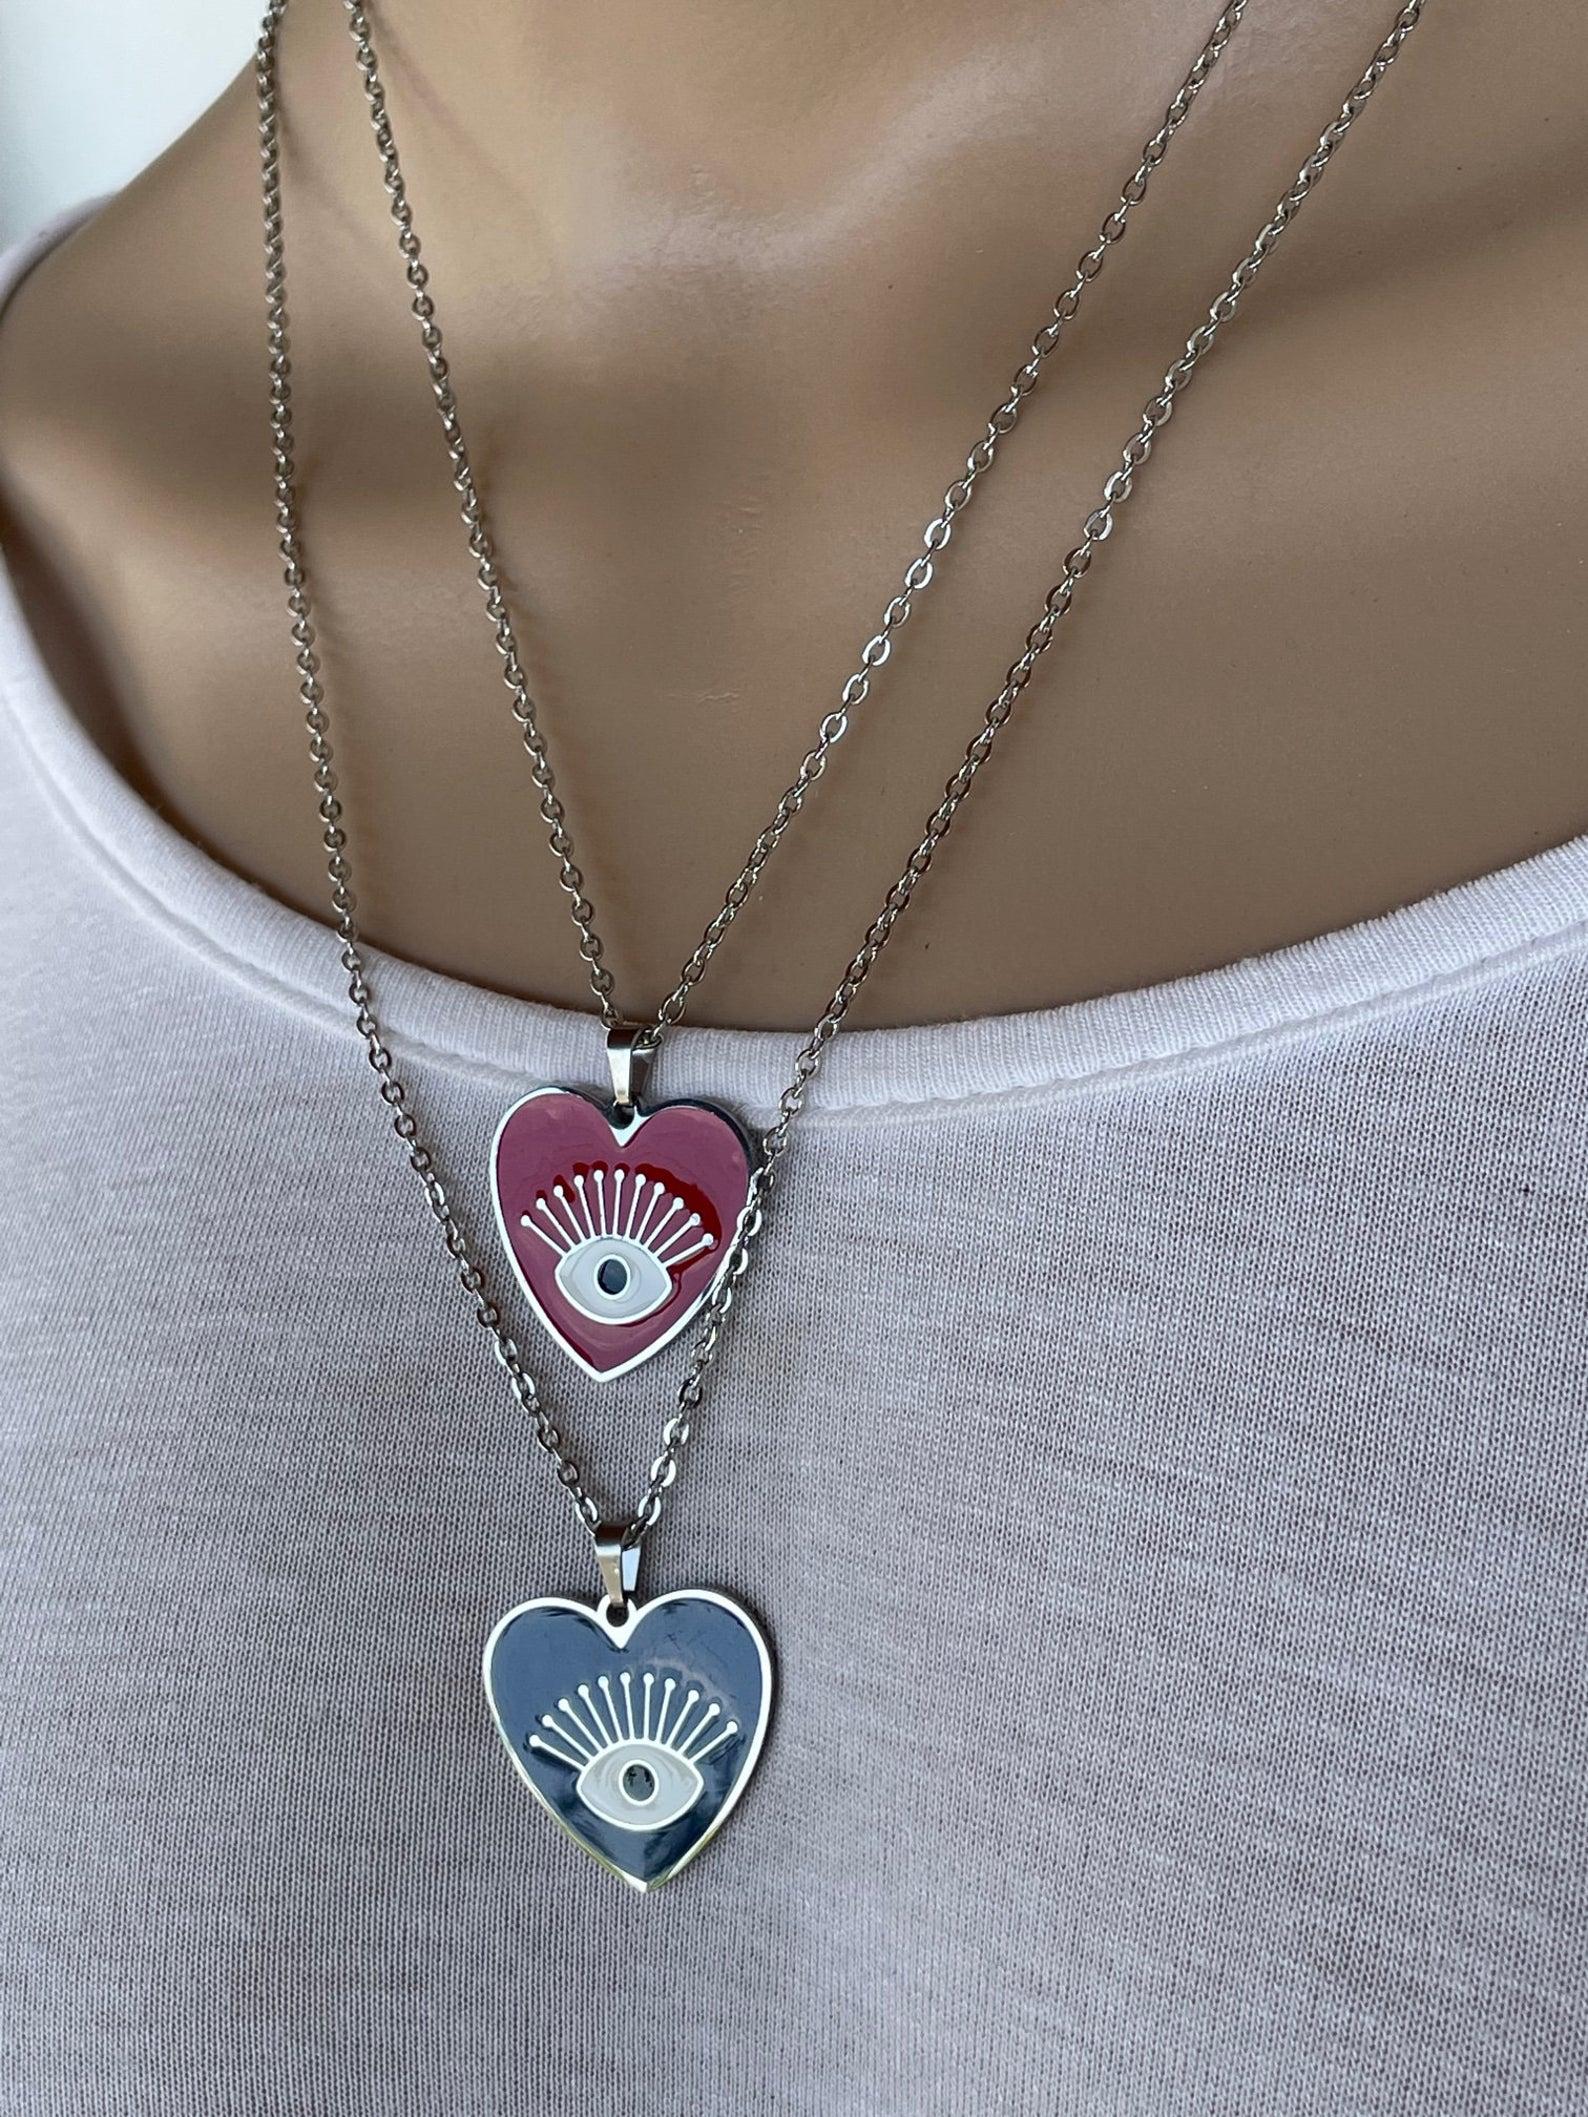 Evil eye heart necklace